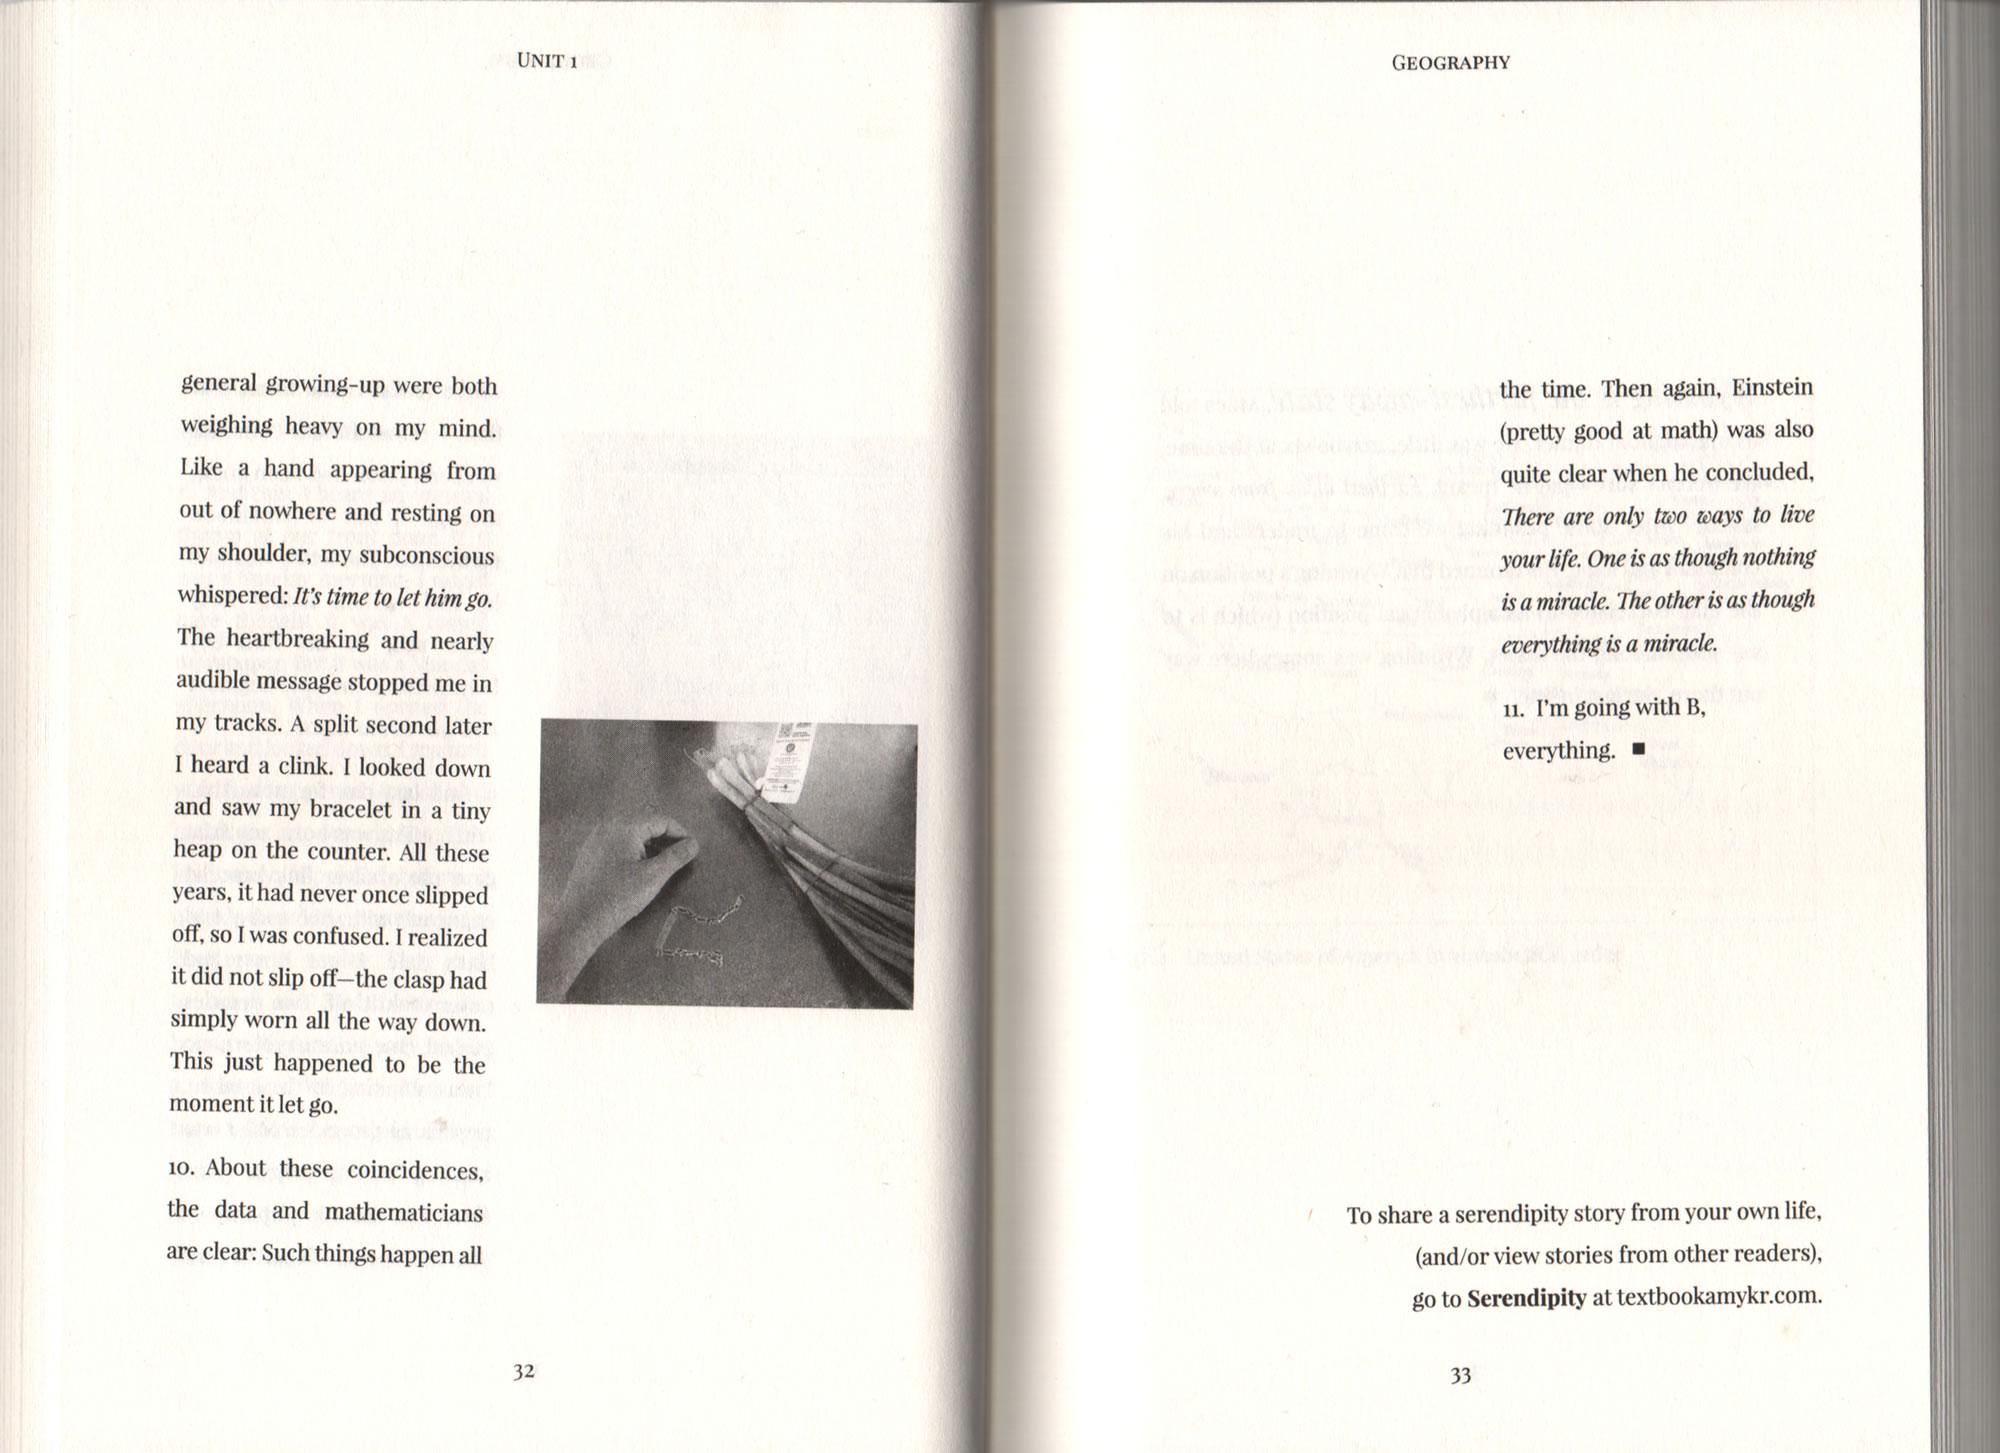 Serendipity | Textbook Amy Krouse Rosenthal